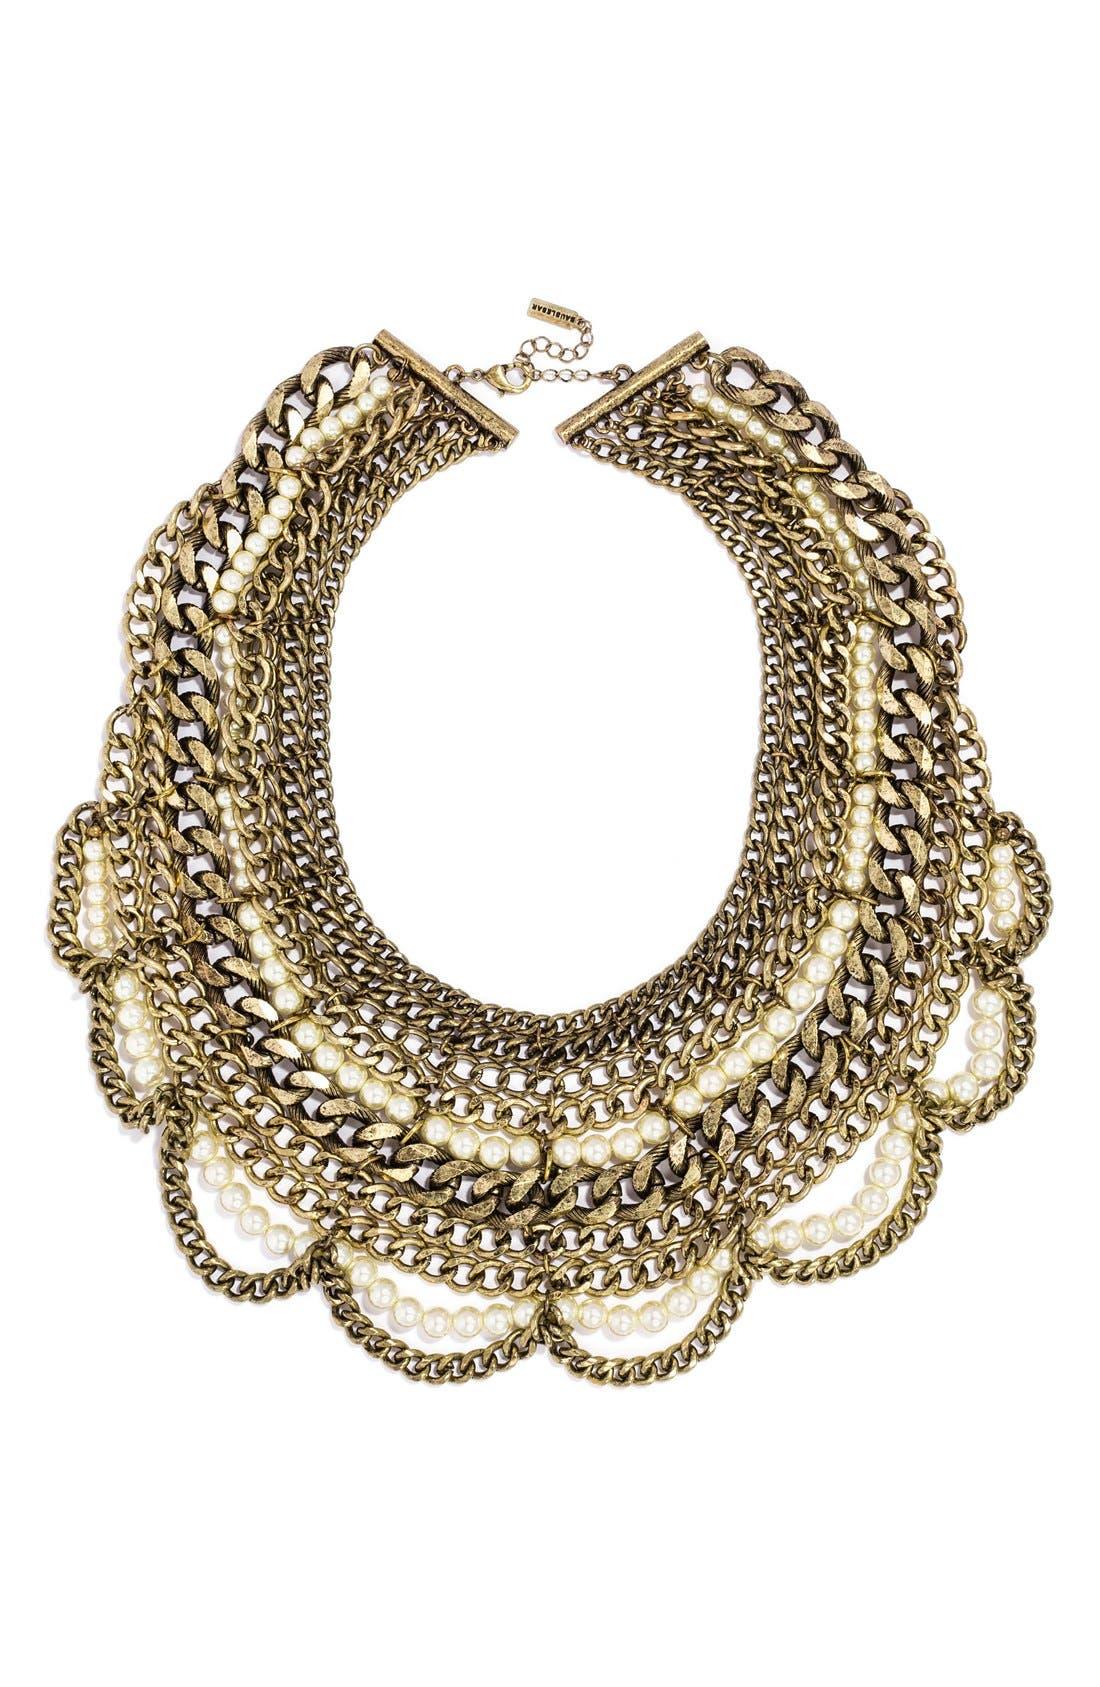 Main Image - BaubleBar 'Courtney 2.0' Necklace